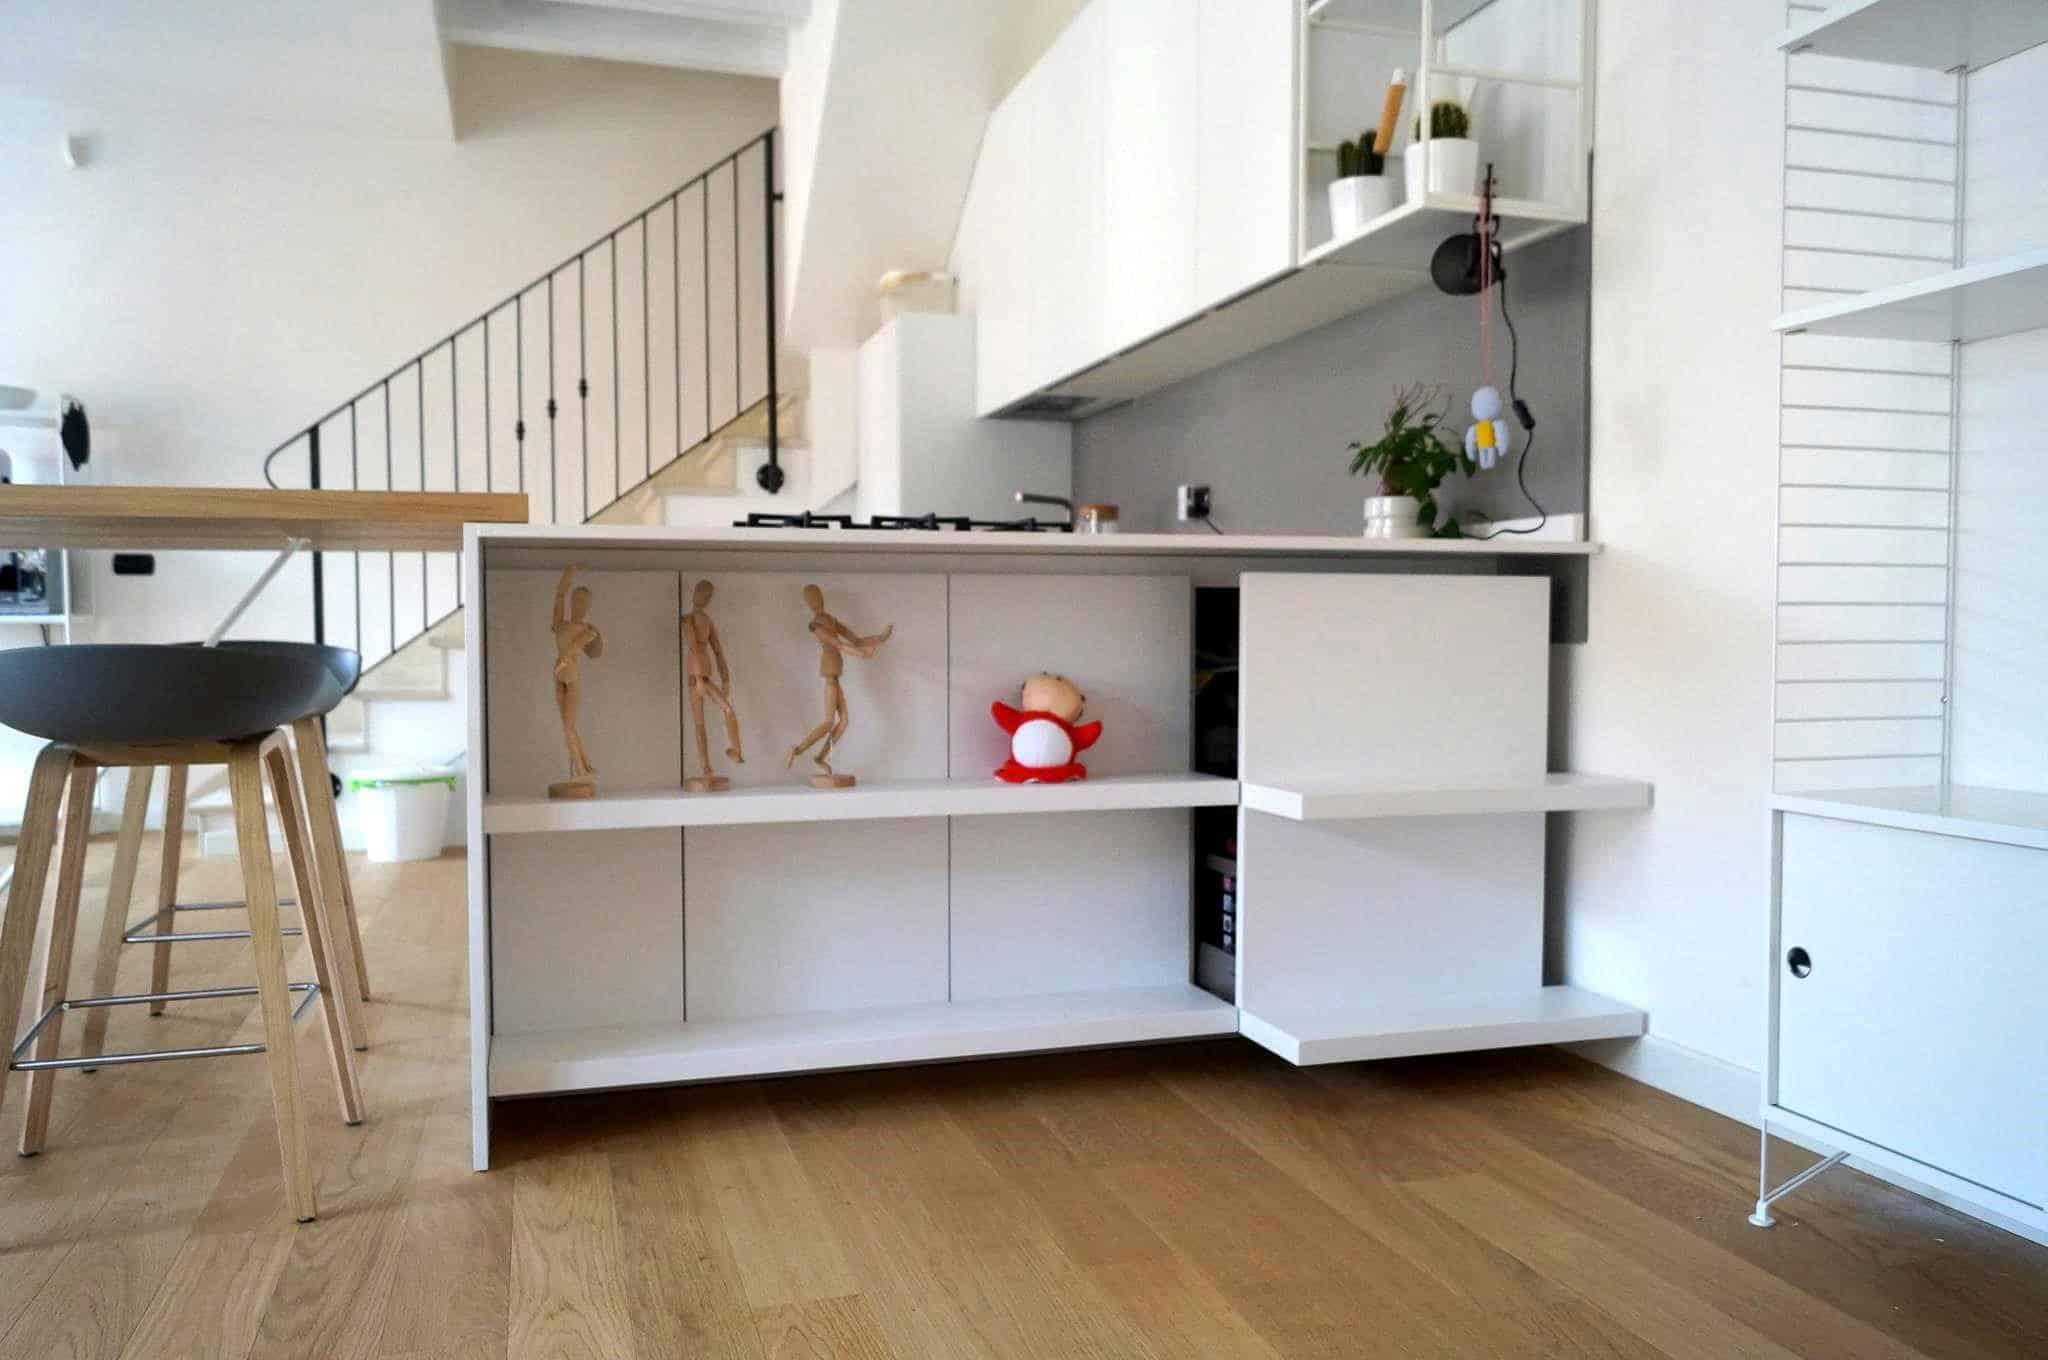 cucina-moderna-bianca-con-penisola-idee-per-recuperare-spazio-in-cucina